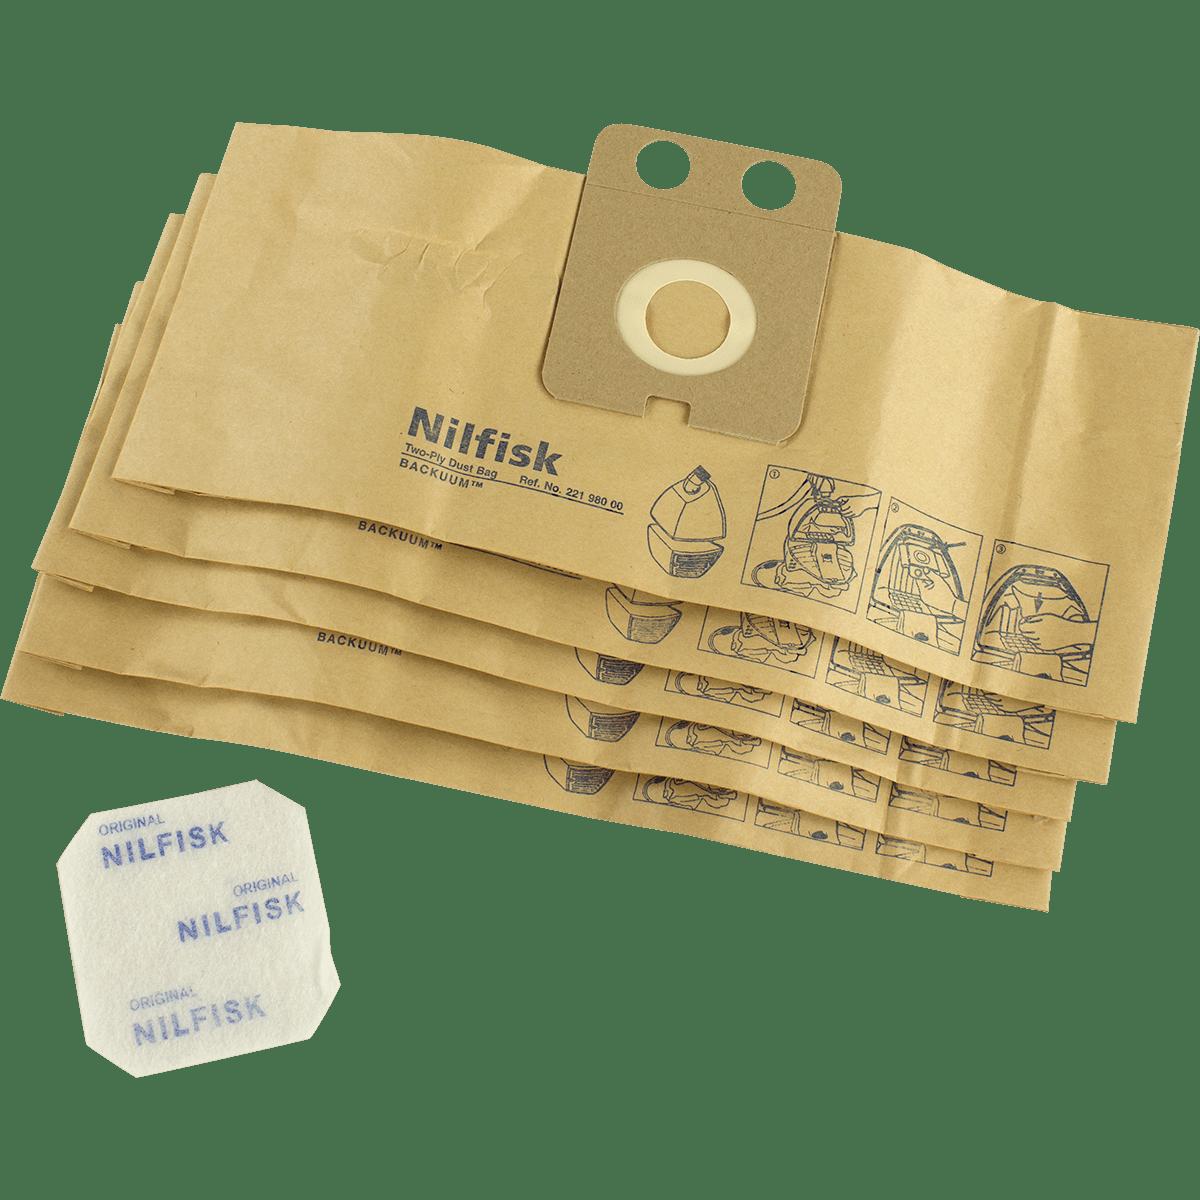 Iq Air Filters >> Nilfisk Back Vacuum Paper Vacuum Bags (qty: 5) (22198000) - Free Shipping